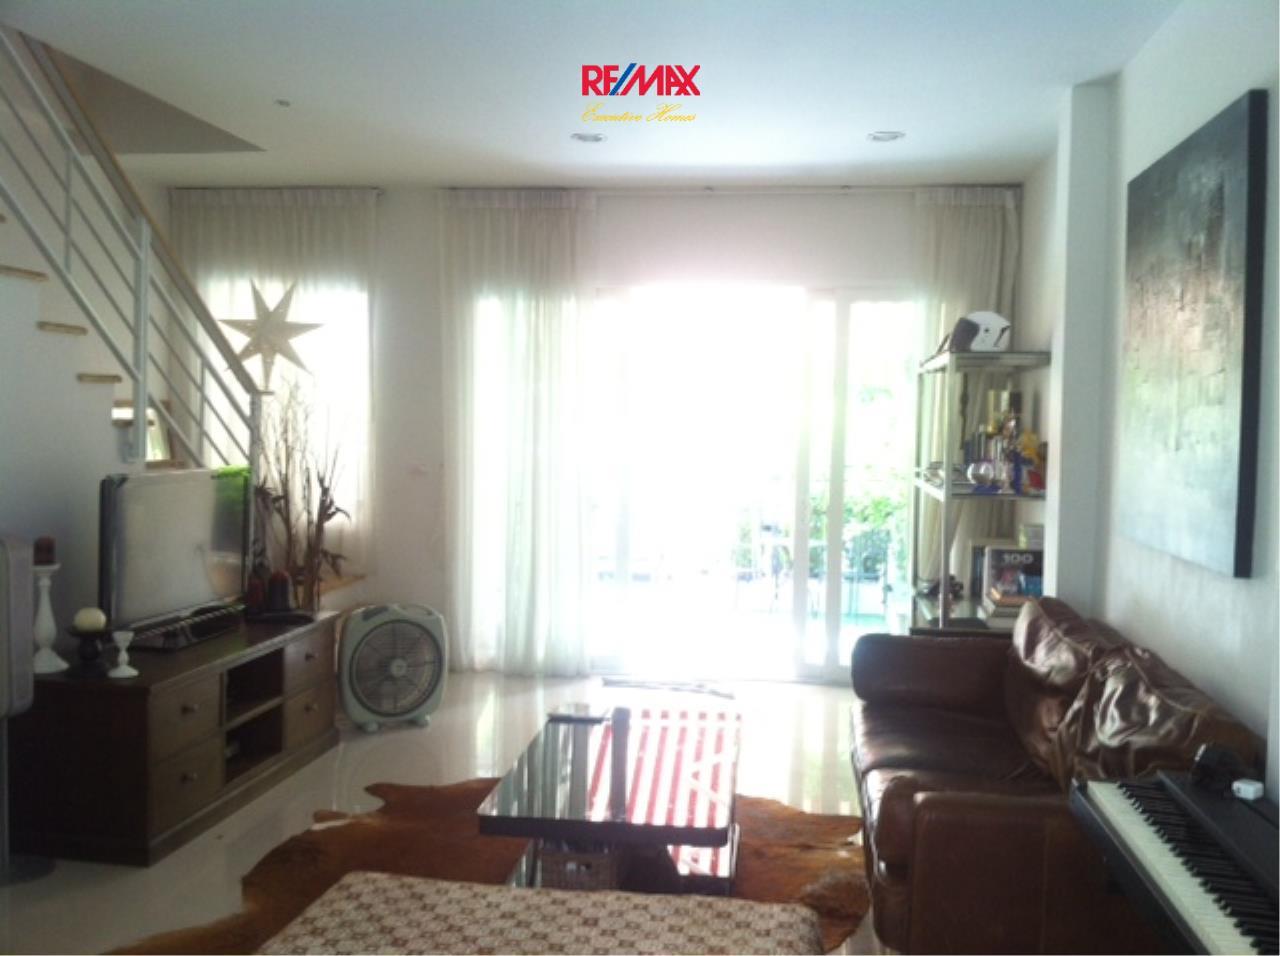 RE/MAX Executive Homes Agency's Nice 3 Bedroom Townhouse for Sale Baan Klang Muang s-sense Rama 9 - Ladprao 1